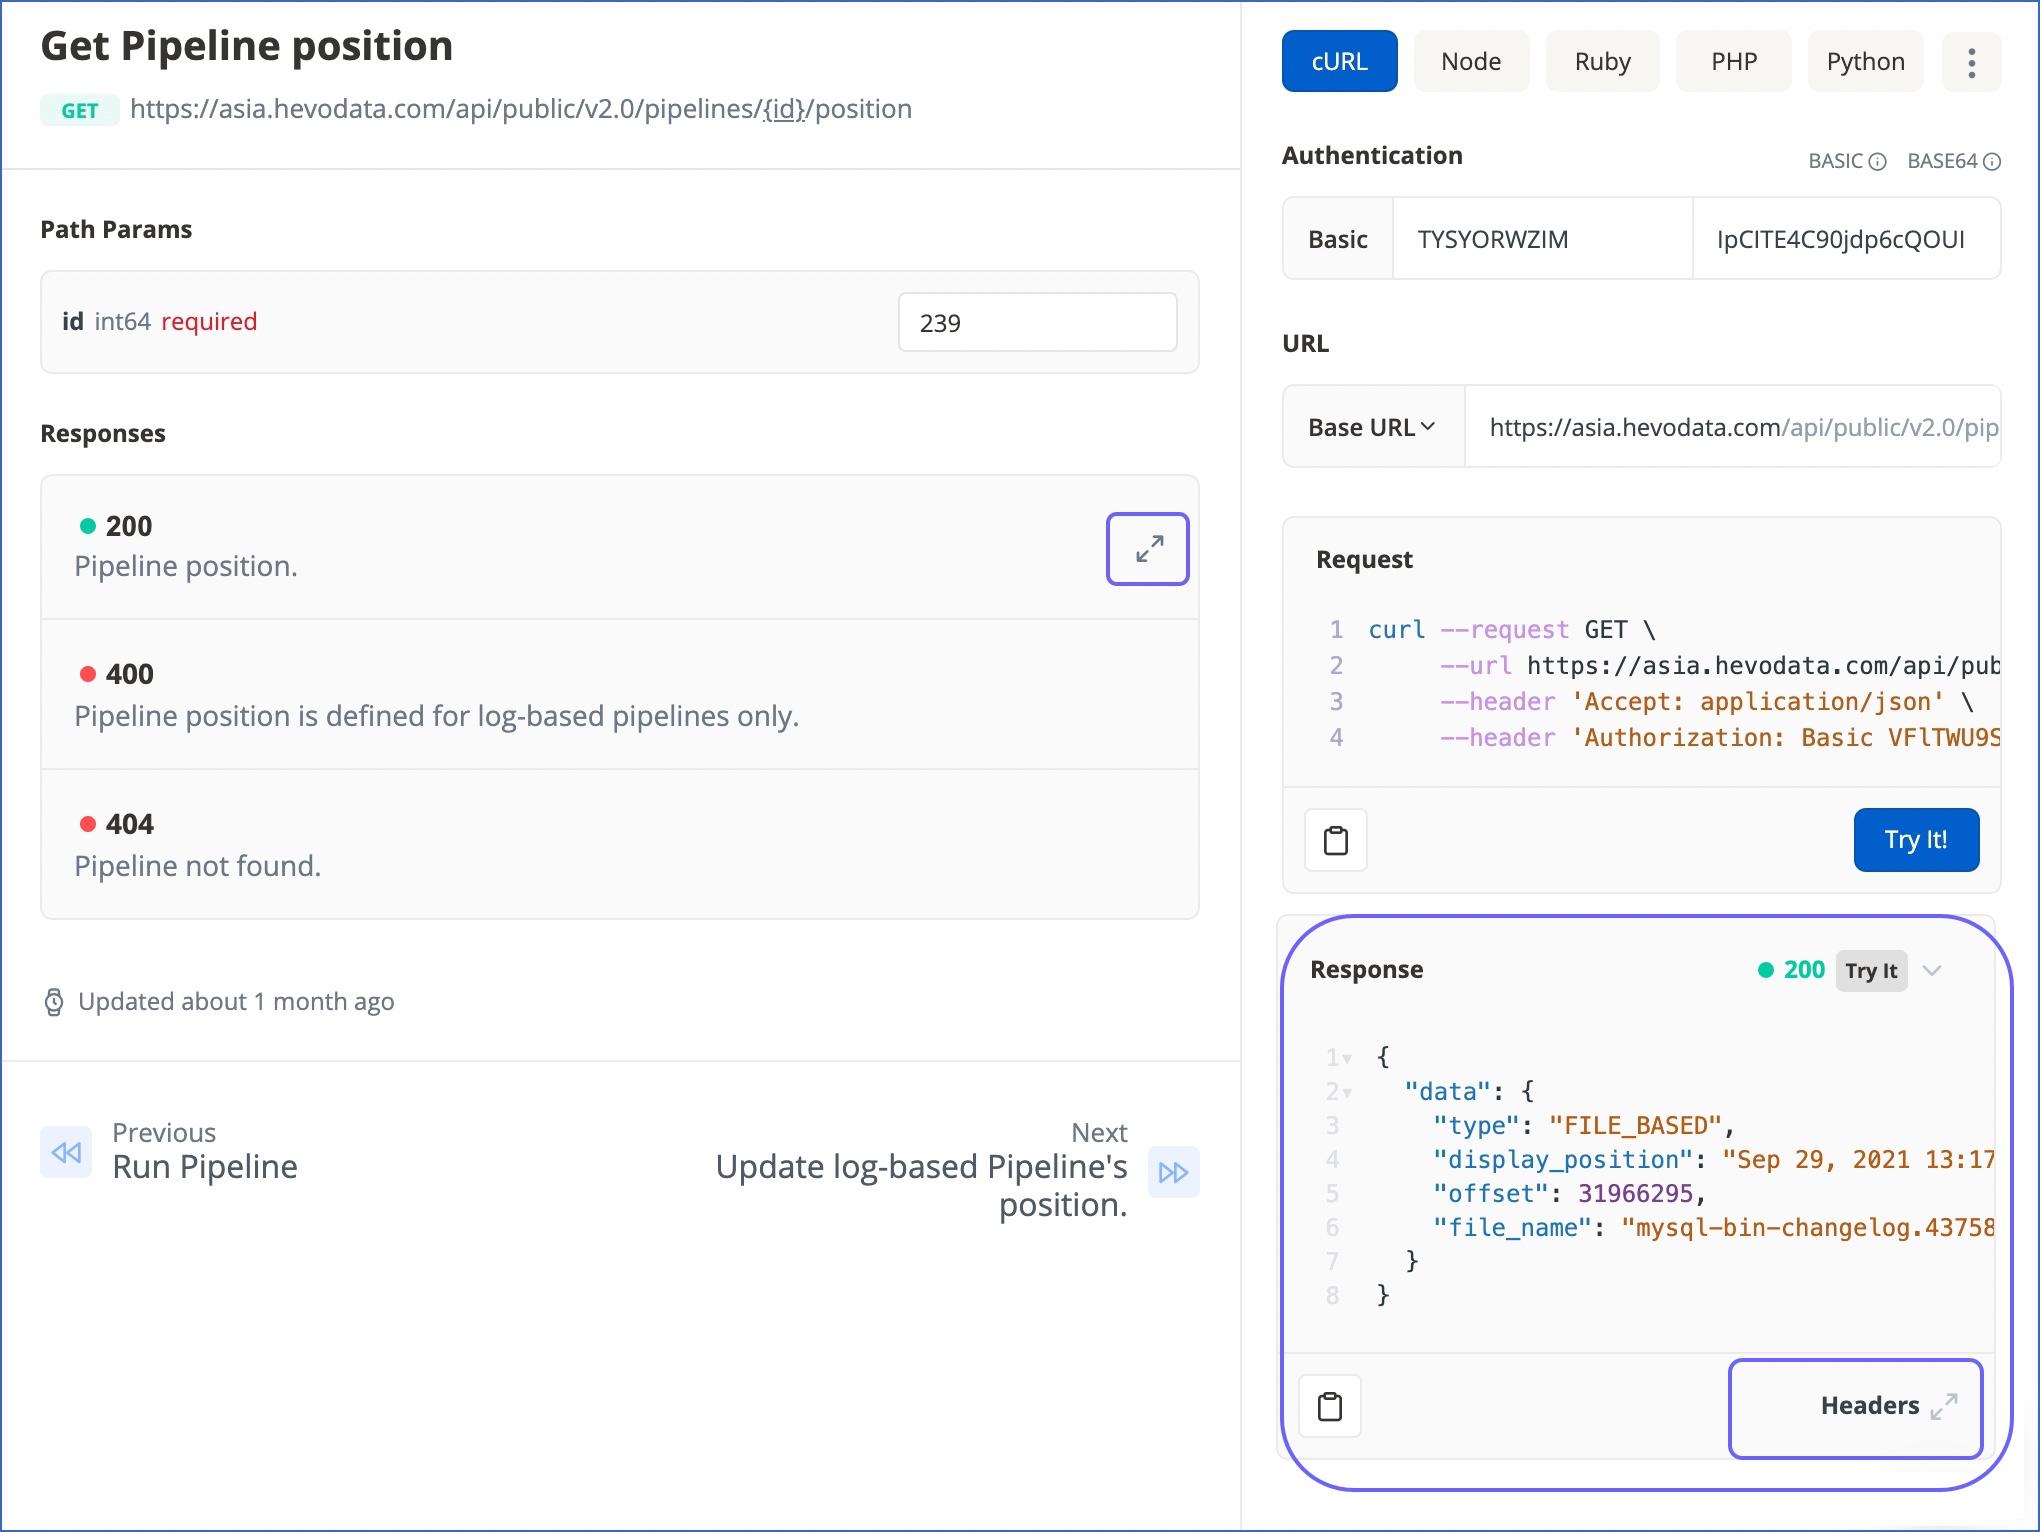 API Response UI